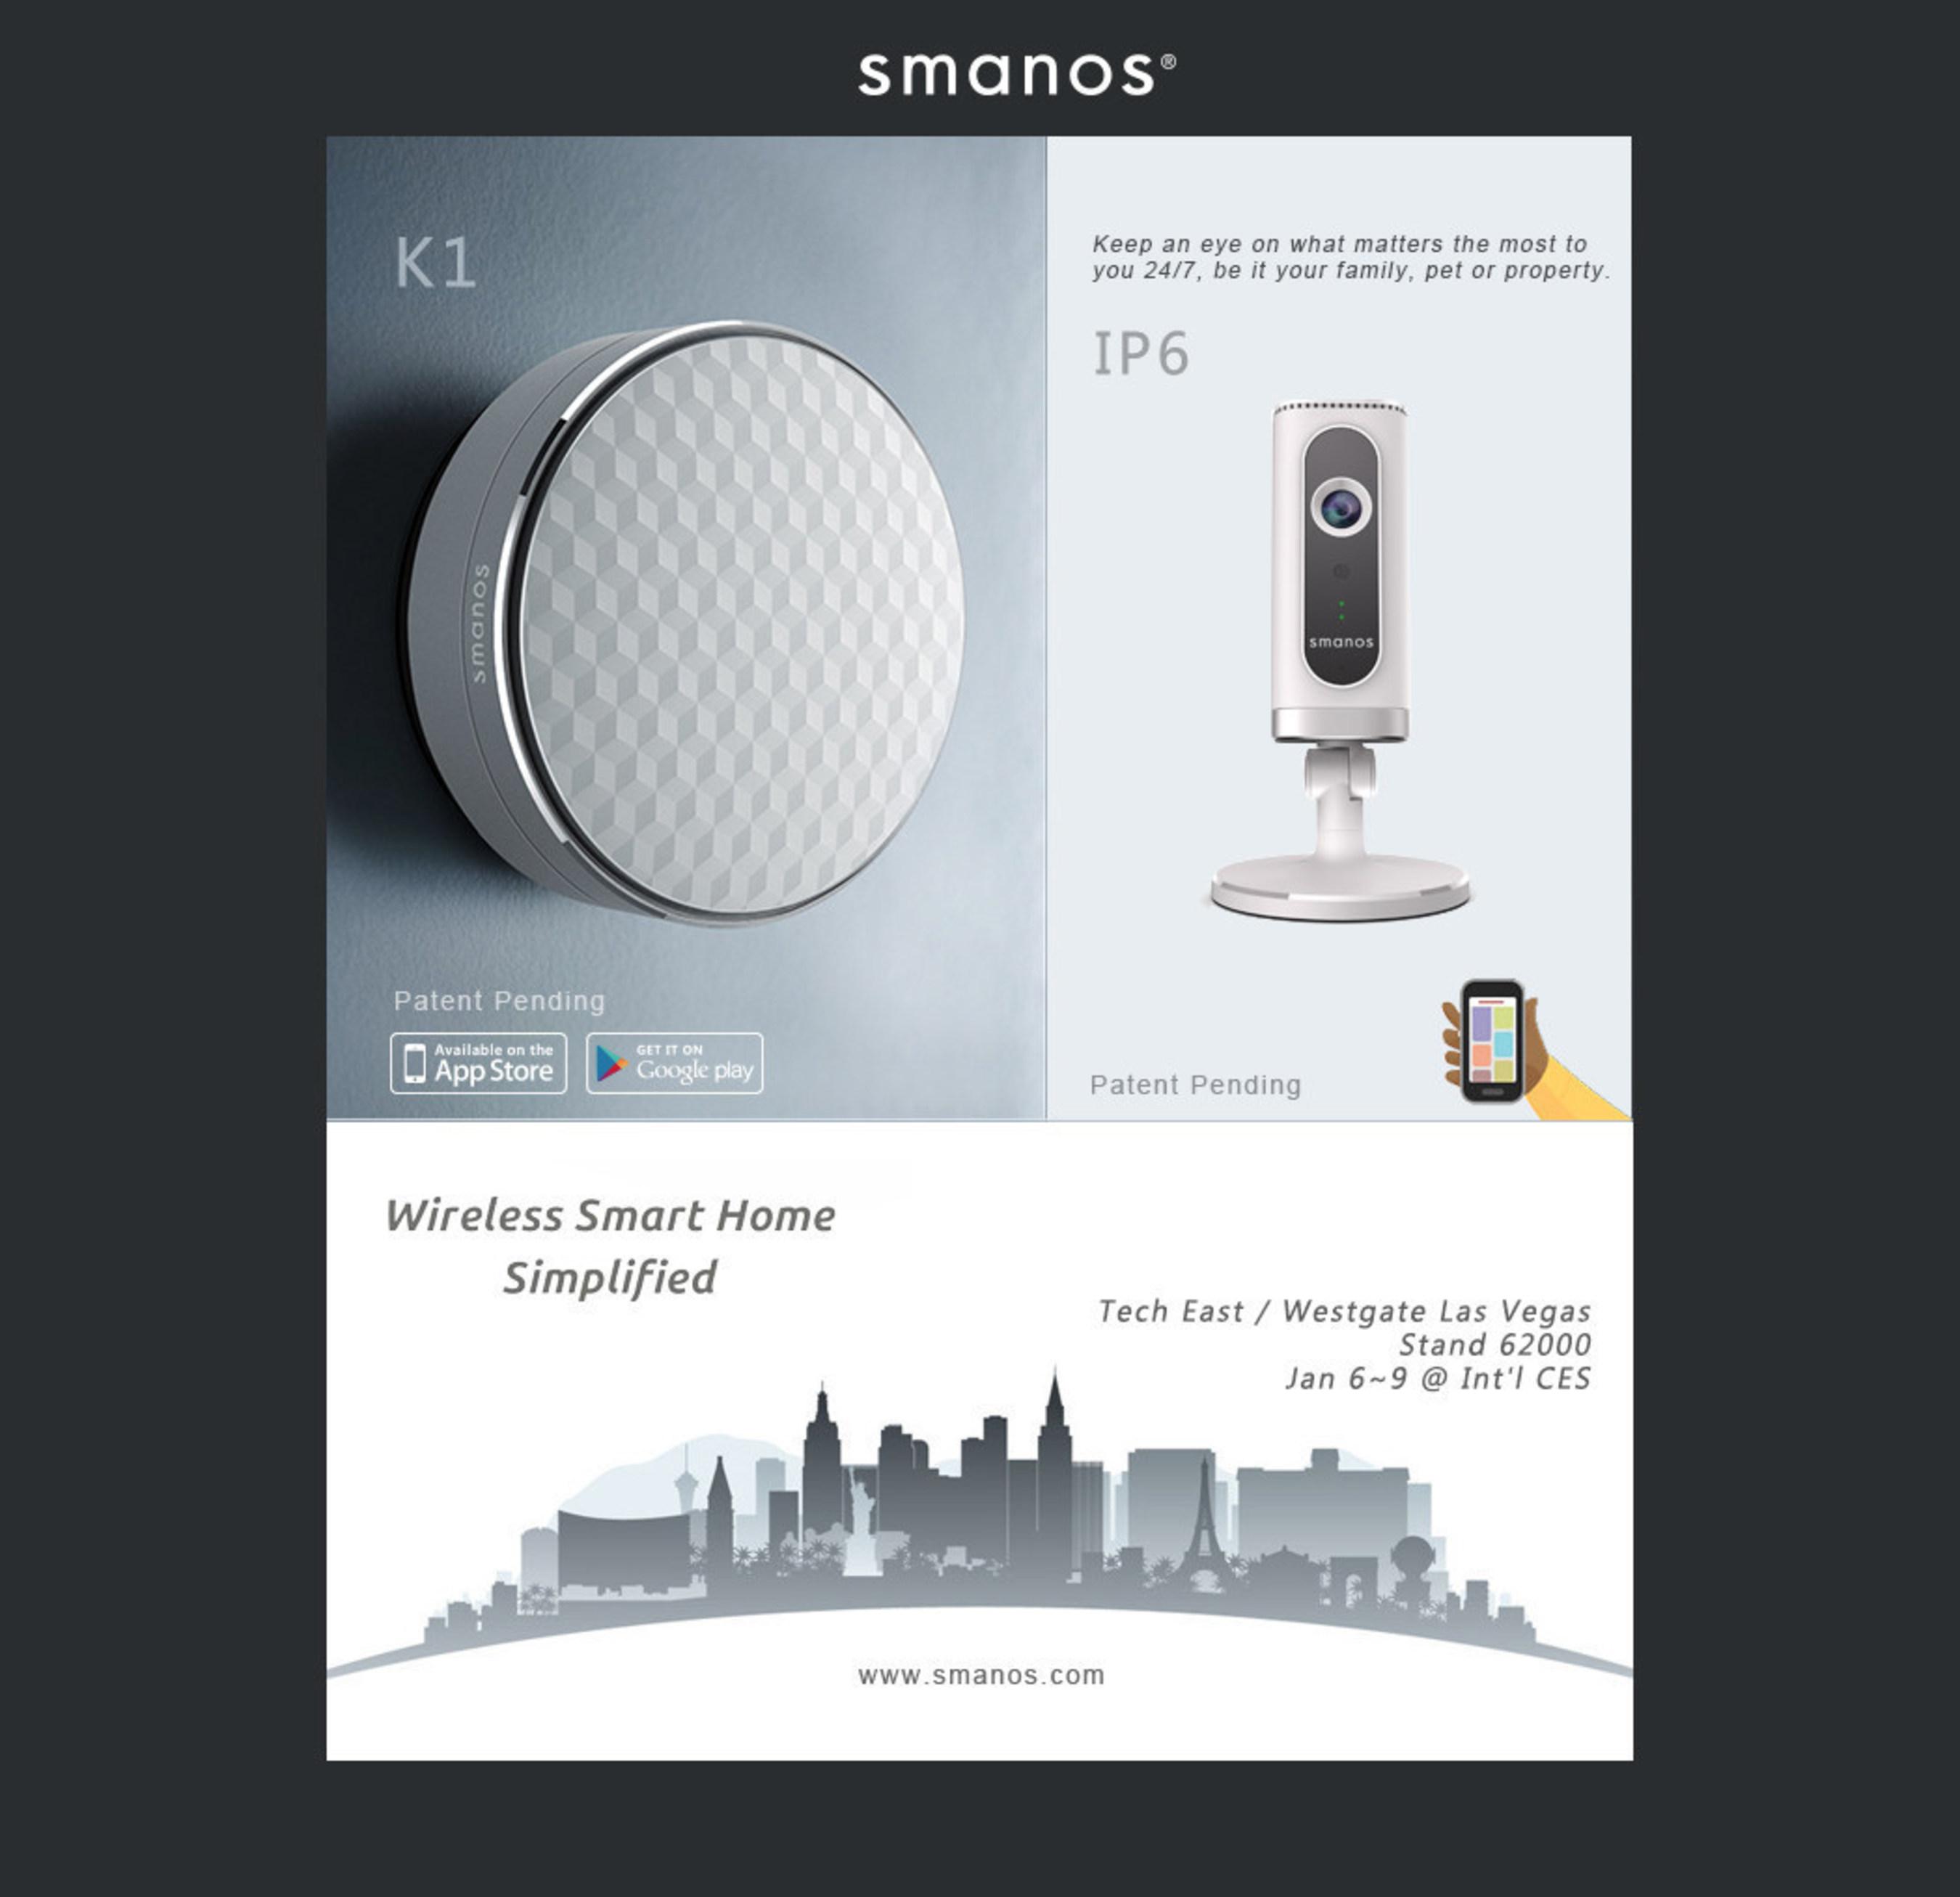 Smart Home Guru Smanos Unveils New Hub And Wifi Camera At International Ces 2015